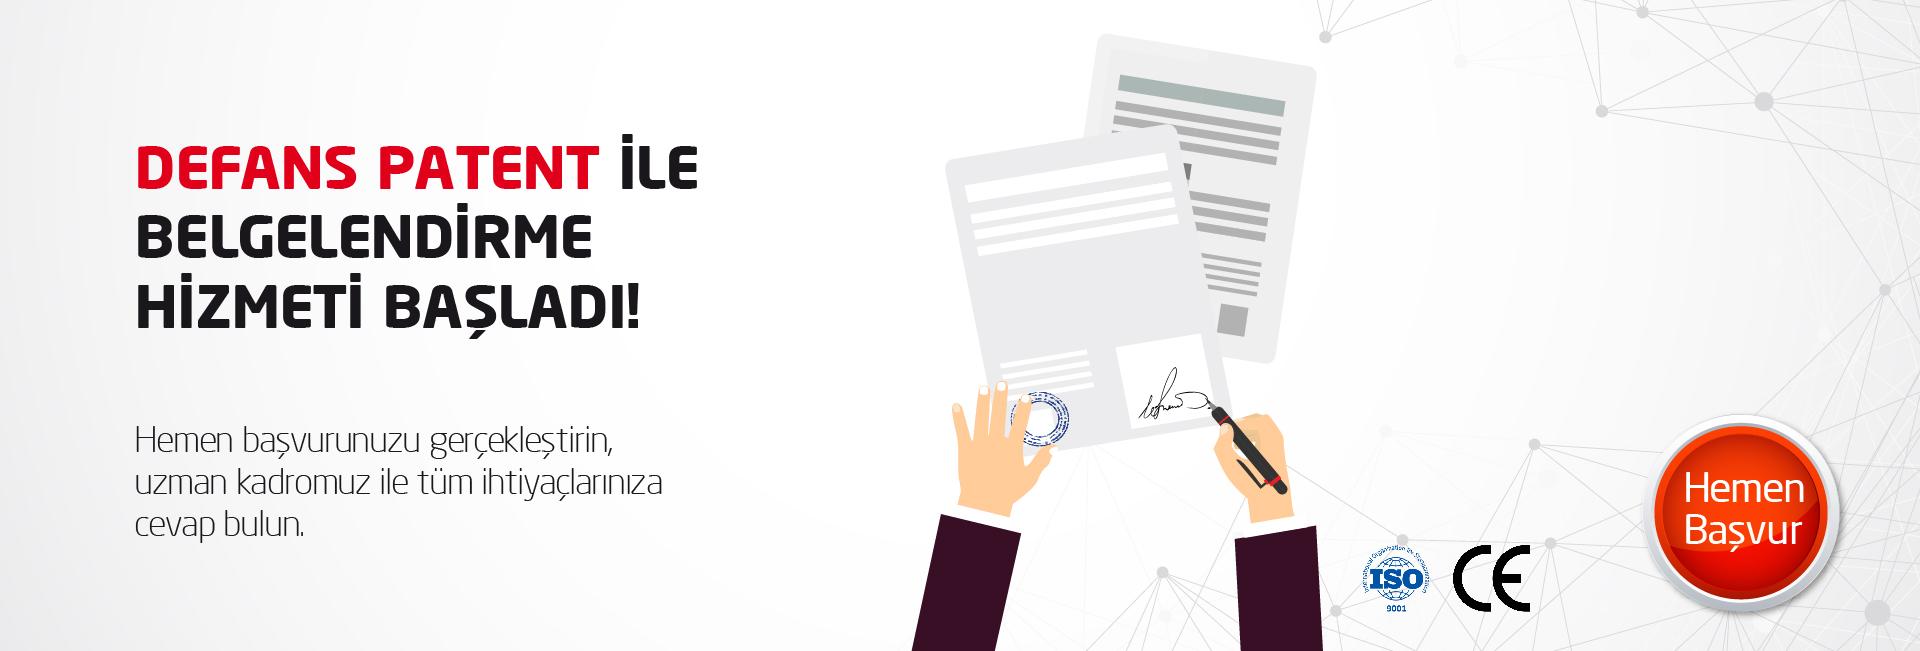 marka tescil, patent, tasarım tescil marka tescil - defans patent belgelendirme - Marka Tescil, Patent ve Tasarım Tescil – Anasayfa